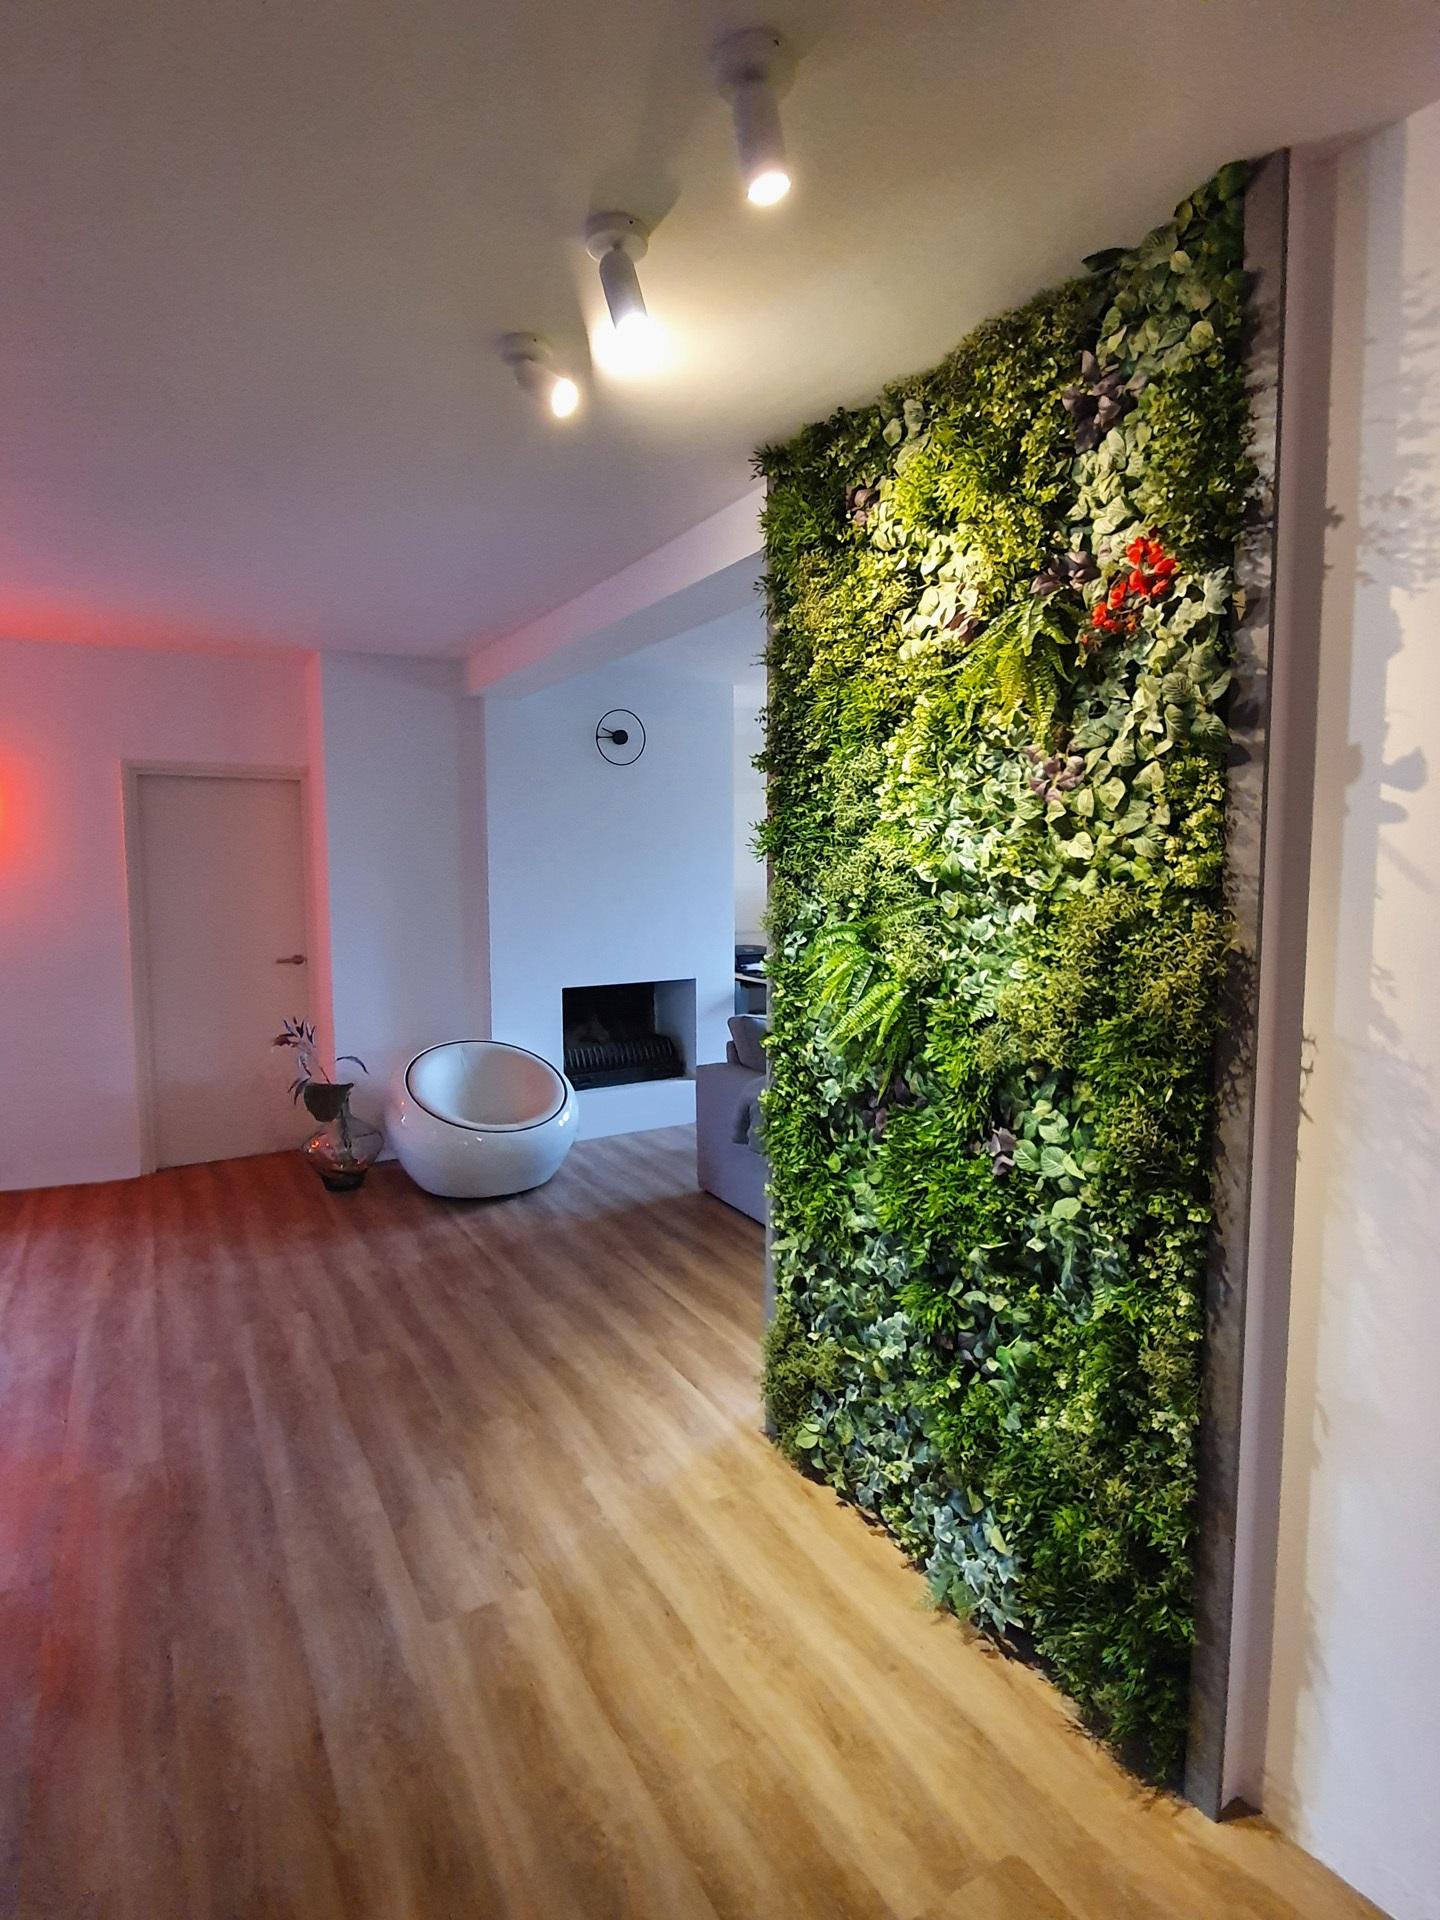 Beste DIY moswand - aandachtspunten? - Wonen & Verbouwen - GoT DE-45